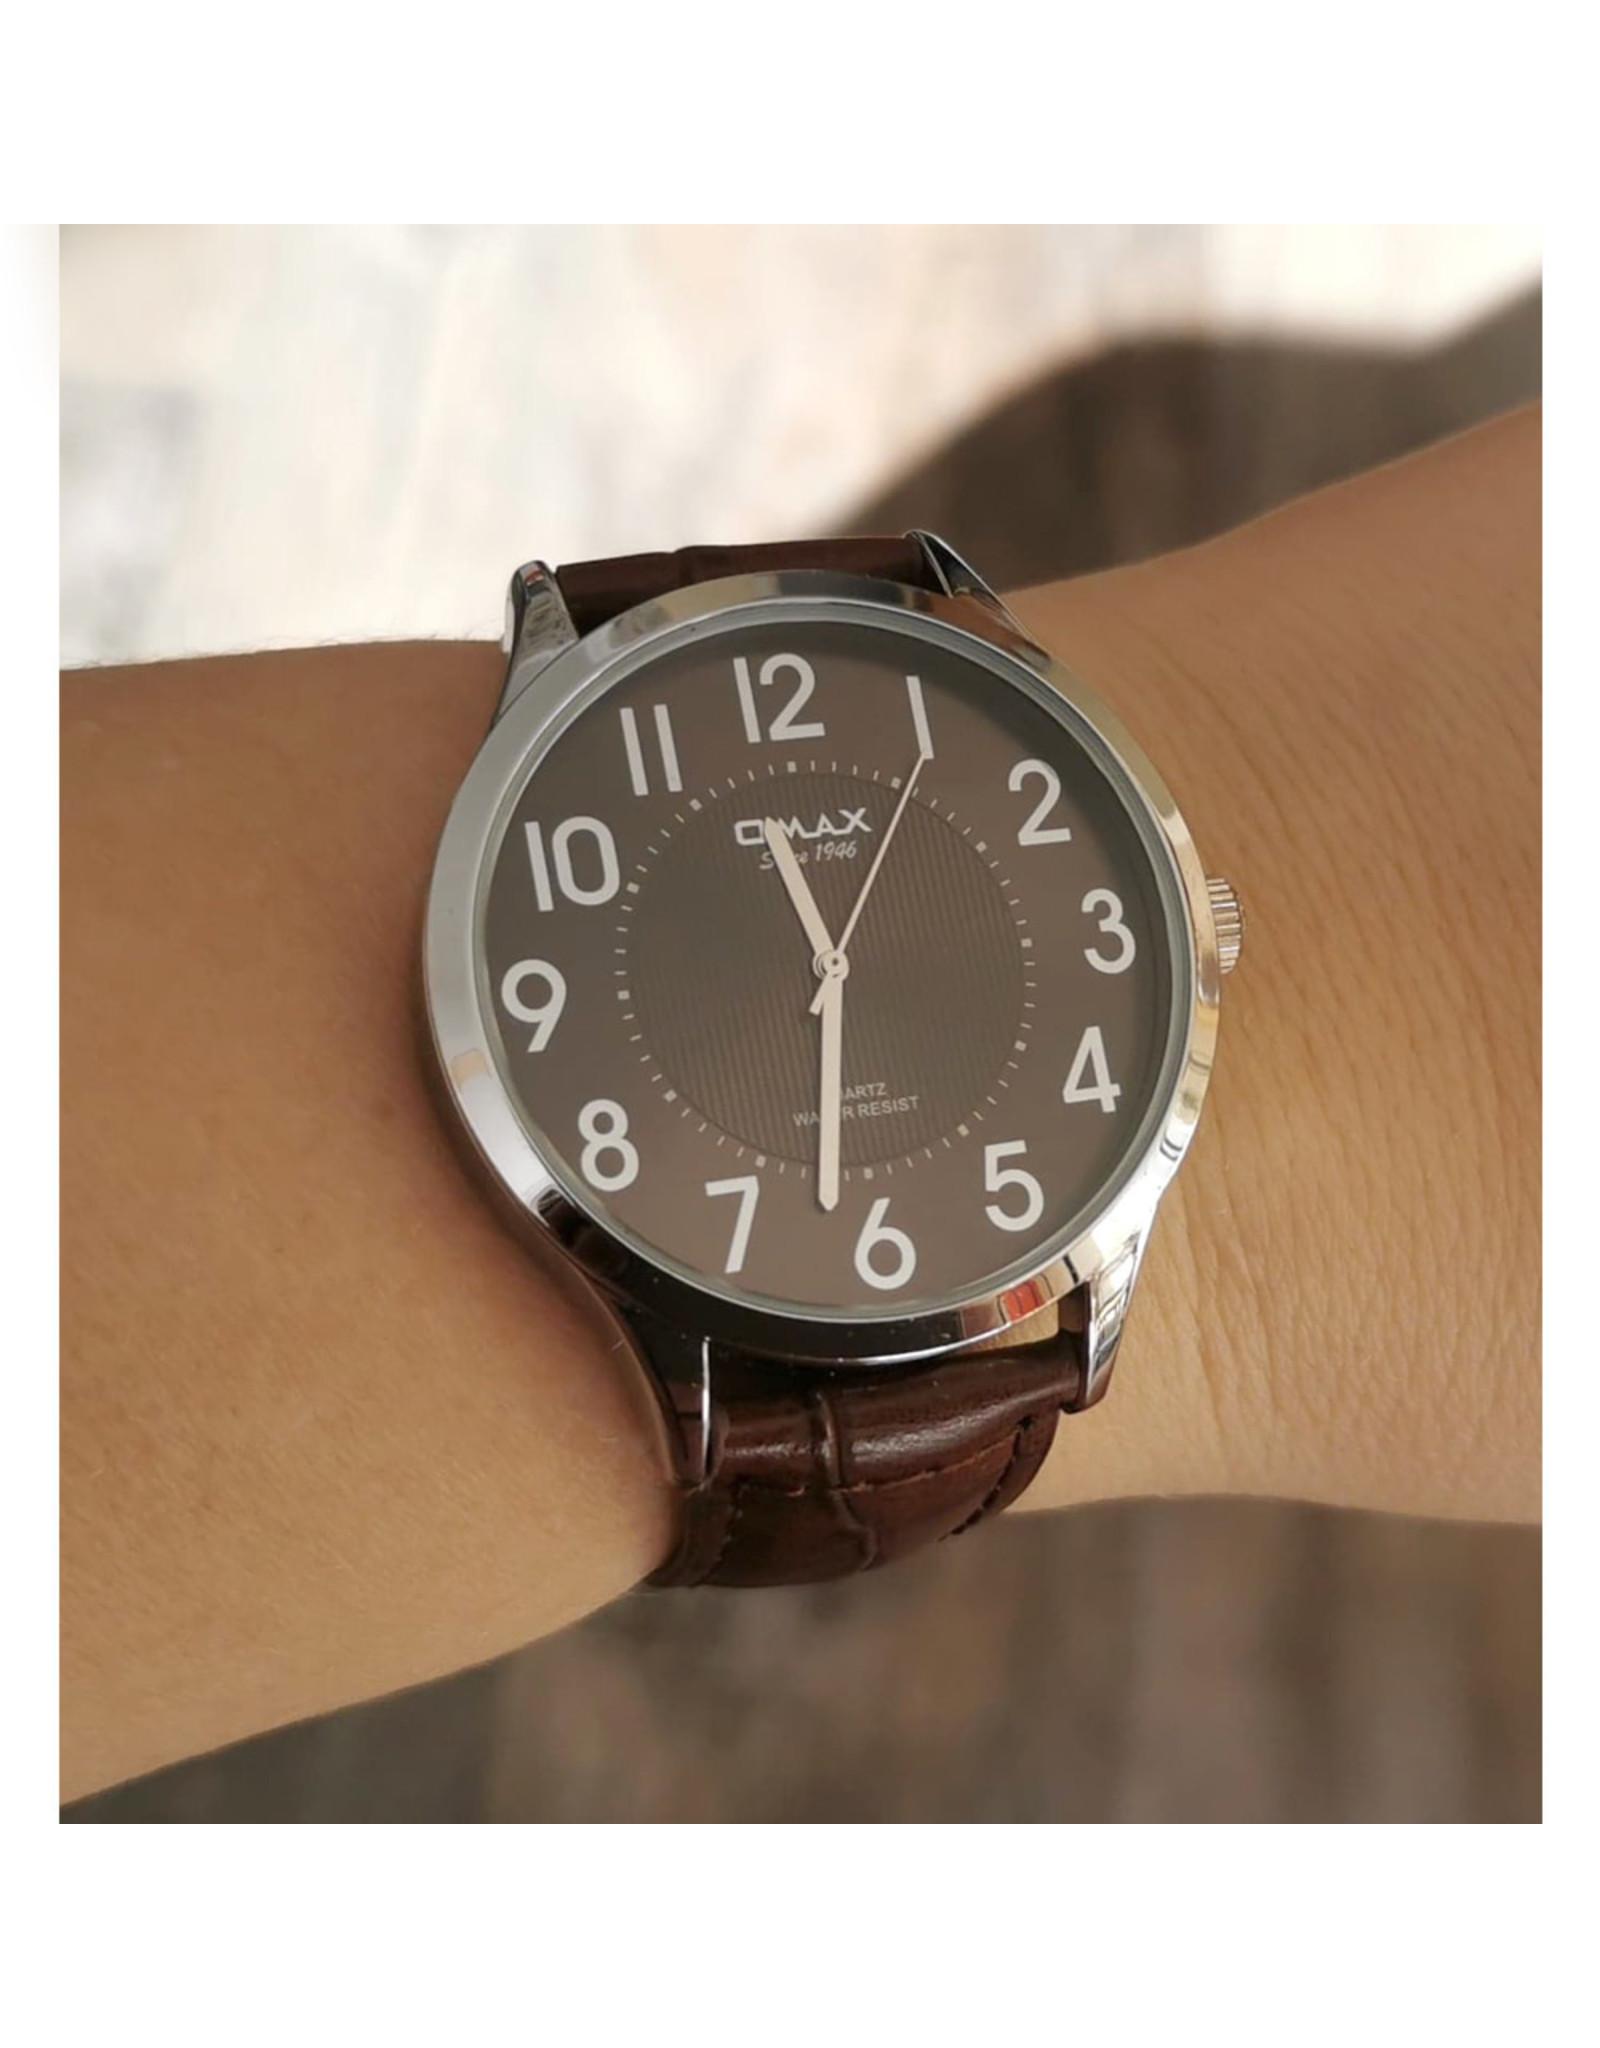 Omax Fond brun, bracelet brun